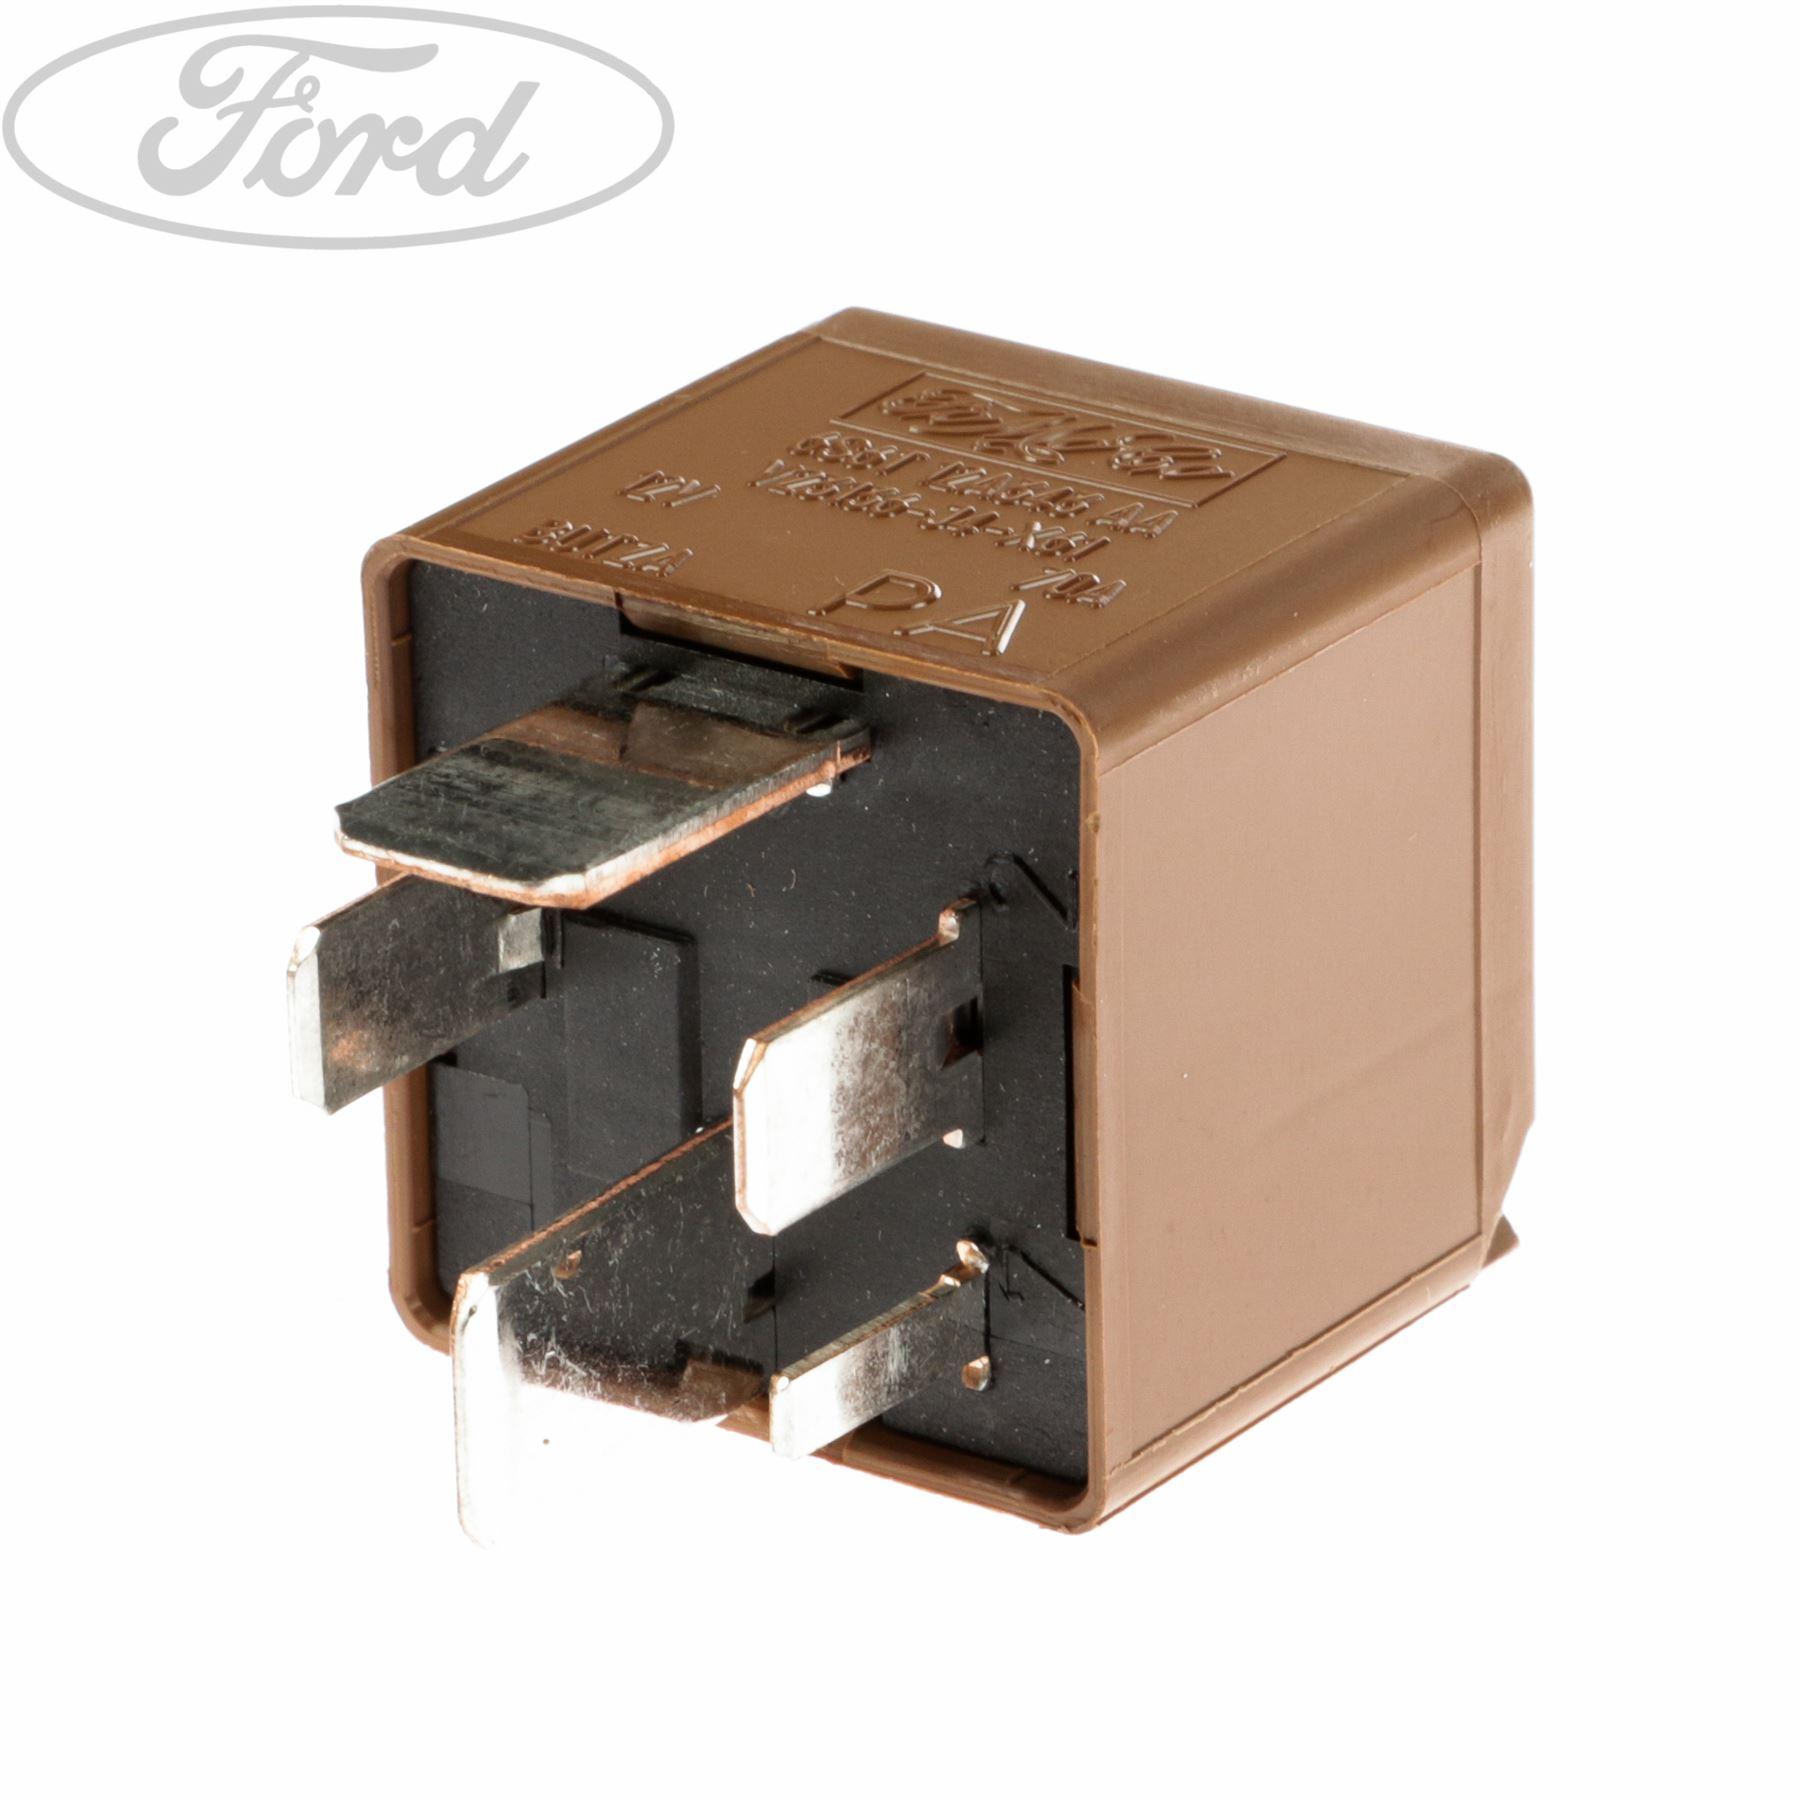 Genuine Ford Fiesta Mk5 Mk6 Heater Glow Plug Relay 5 Blade Mini Tyco 1435908